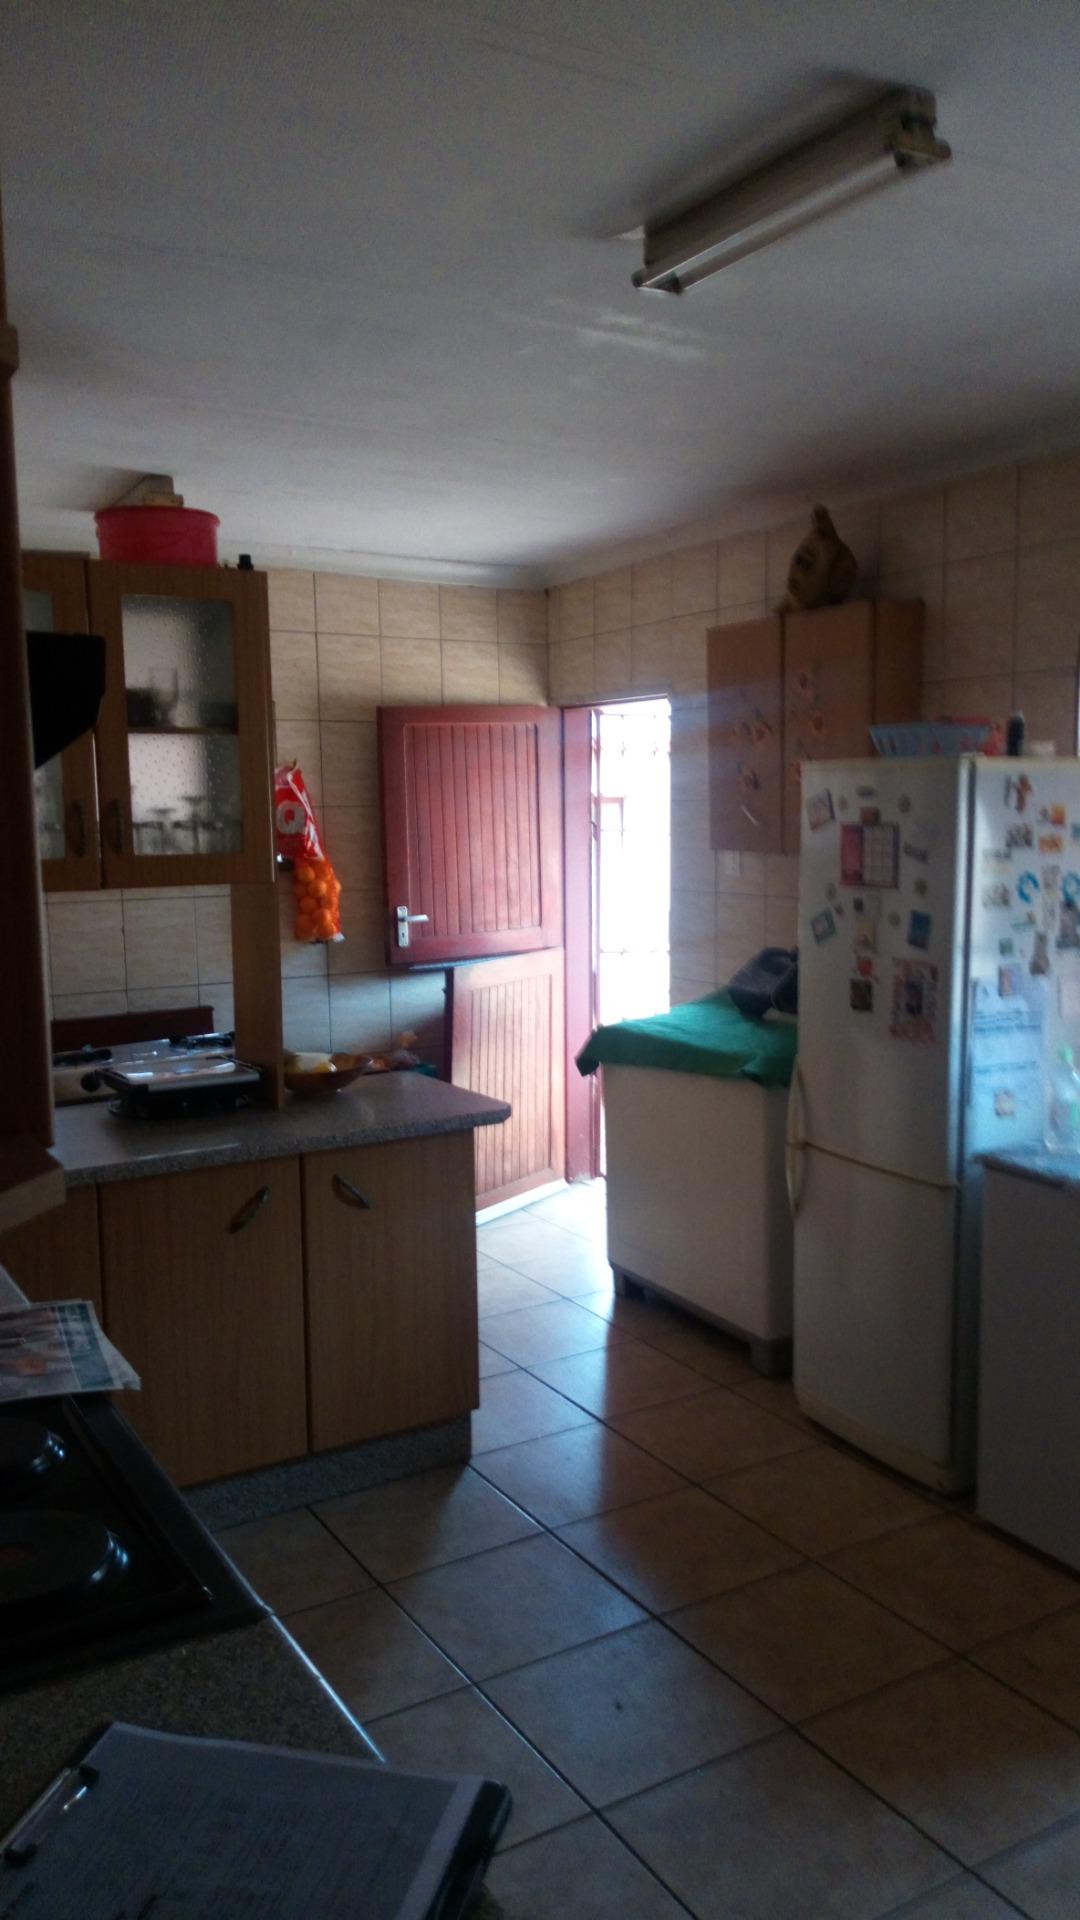 House For Sale in Vanderbijlpark CW 1